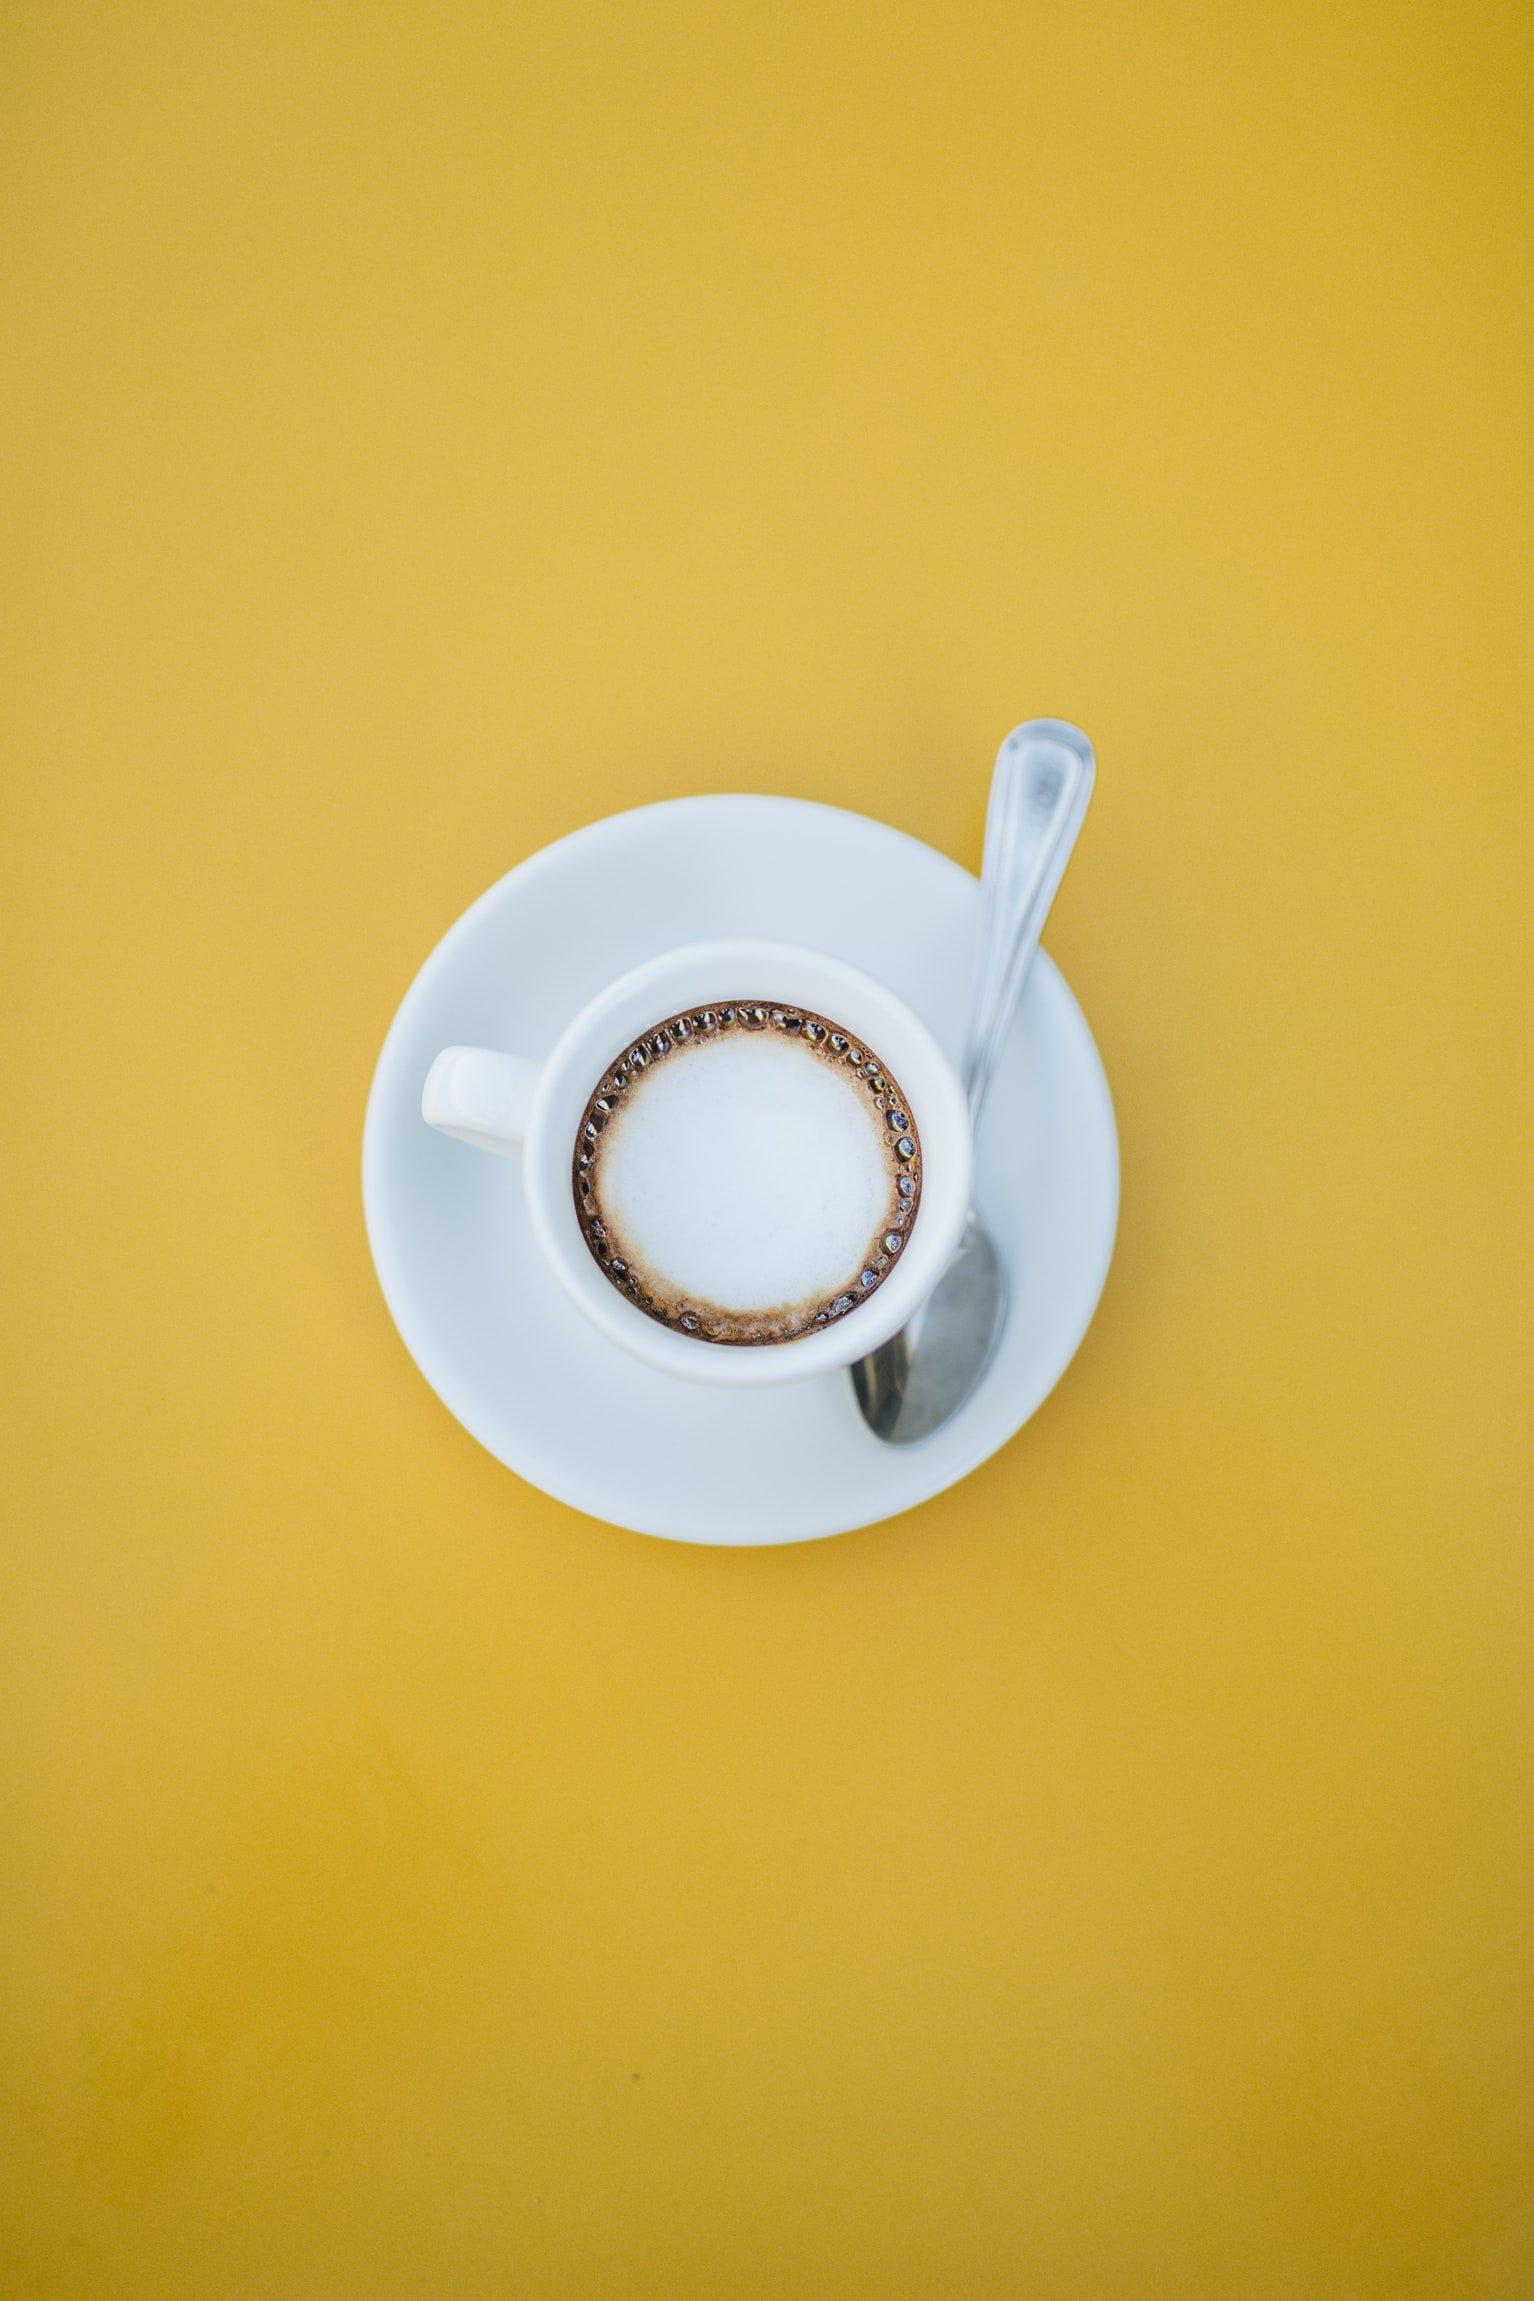 O que é café macchiato e como fazê-lo? Descubra agora mesmo!